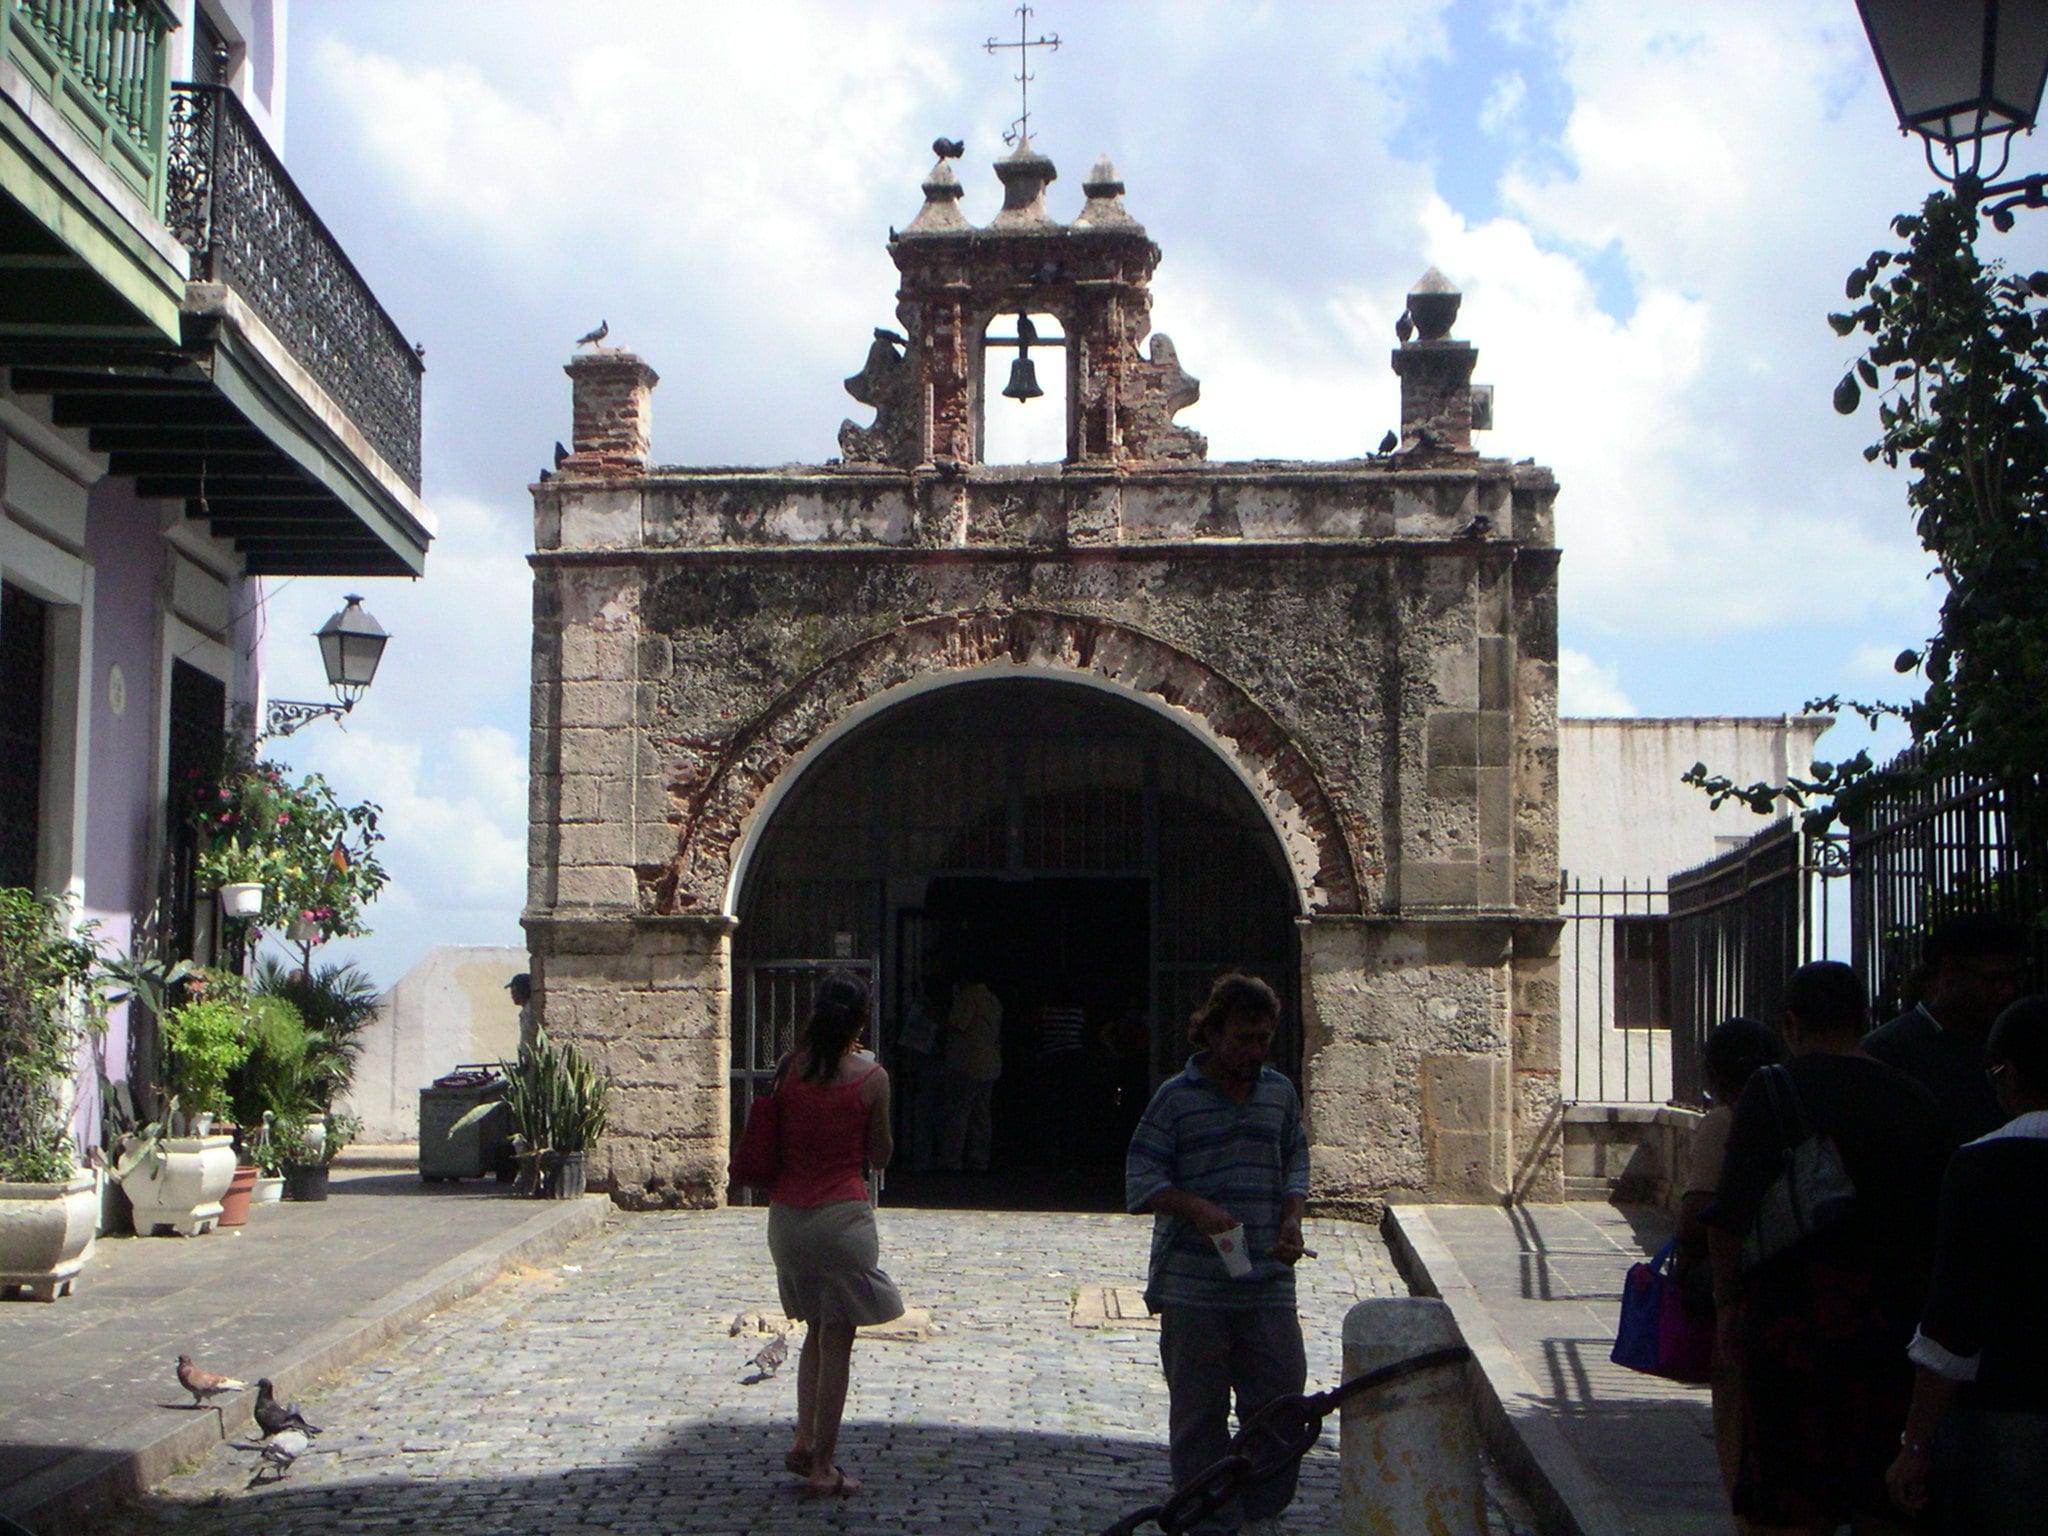 Capilla del Santo Cristo is a top Puerto Rico landmark